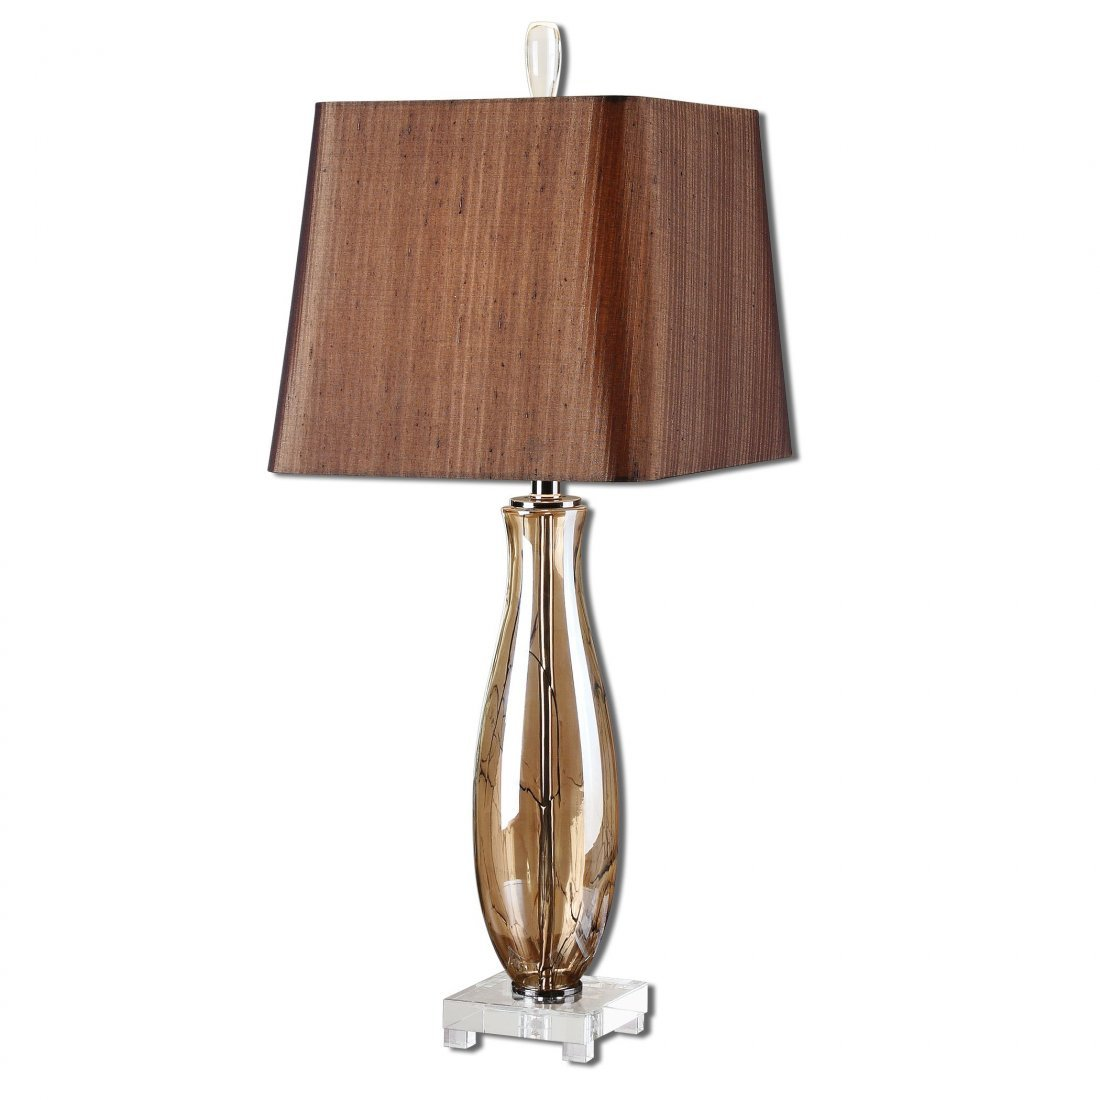 GATTIS AMBER GLASS TABLE LAMP